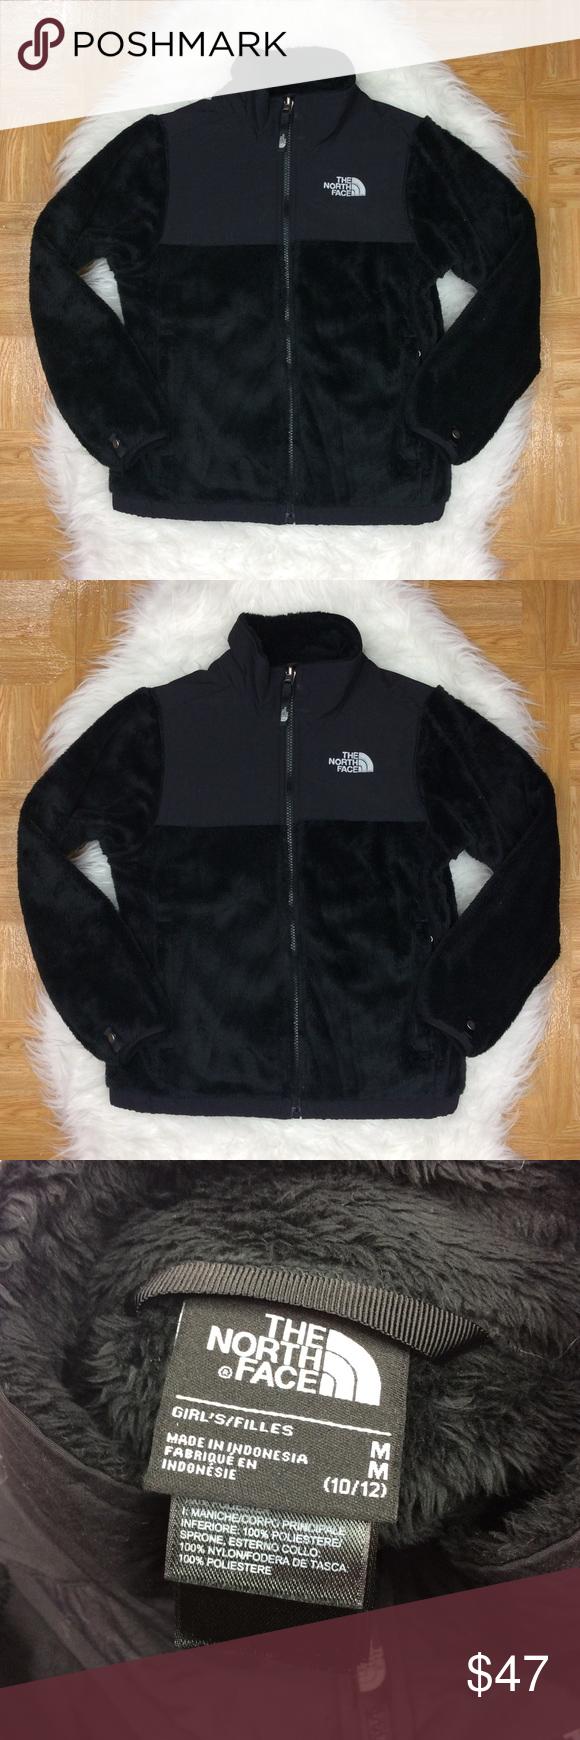 The North Face Girls Denali Fuzzy Fleece Jacket The North Face Denali Fuzzy Fleece Jacket Black Style Aqlk Gir North Face Girls Clothes Design Fleece Jacket [ 1740 x 580 Pixel ]